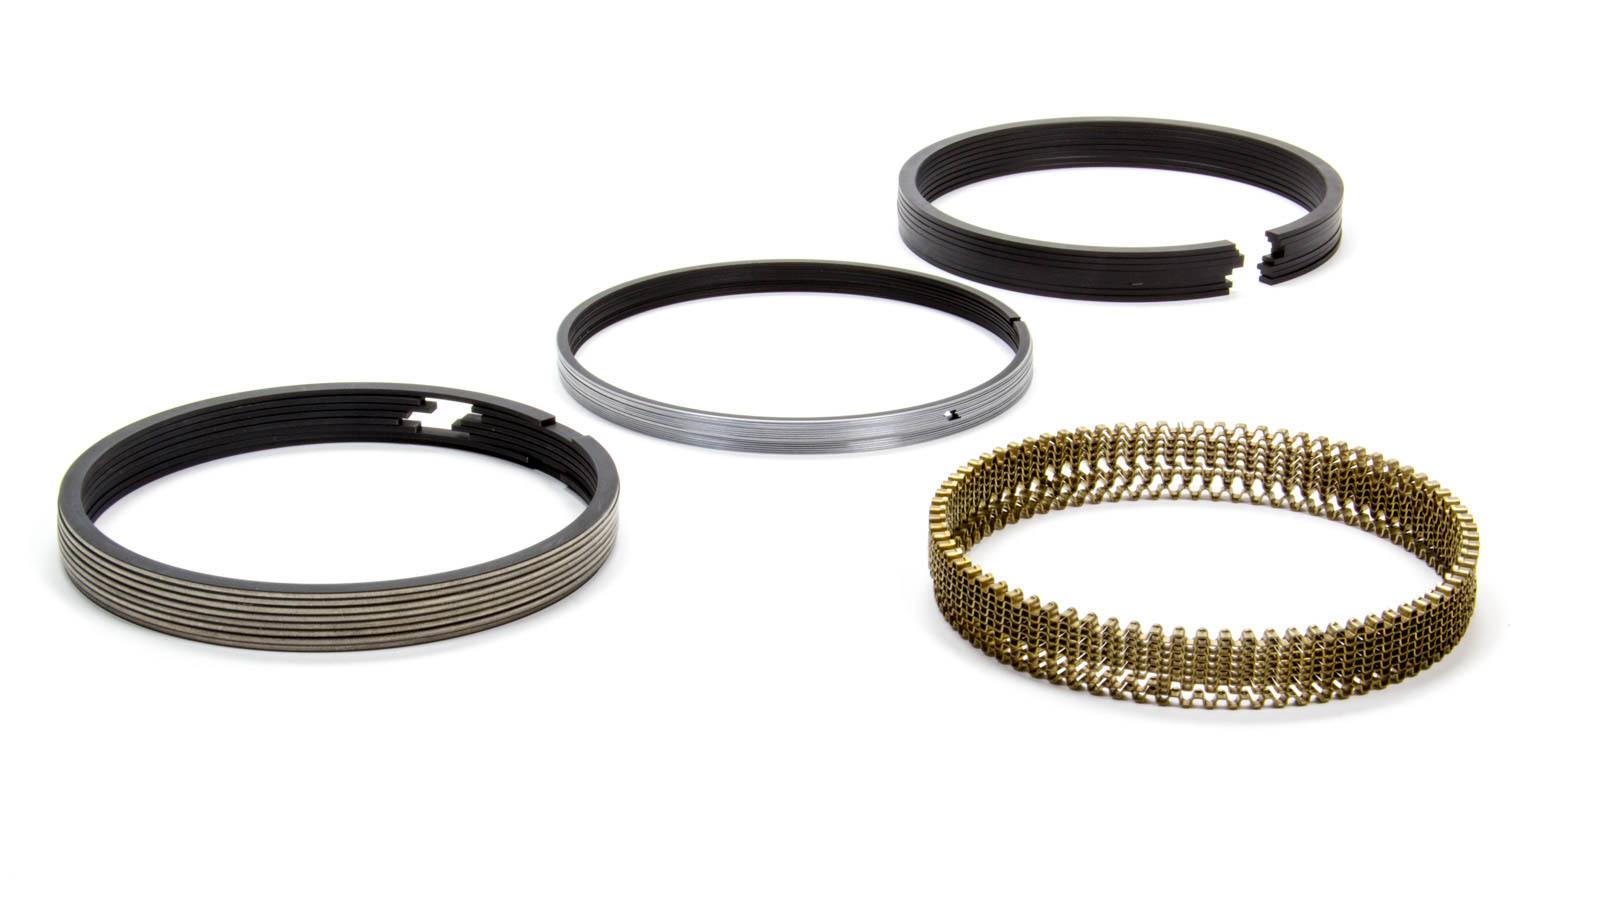 Piston Ring Set 4.010 Classic 2.0 1.5 4.0mm